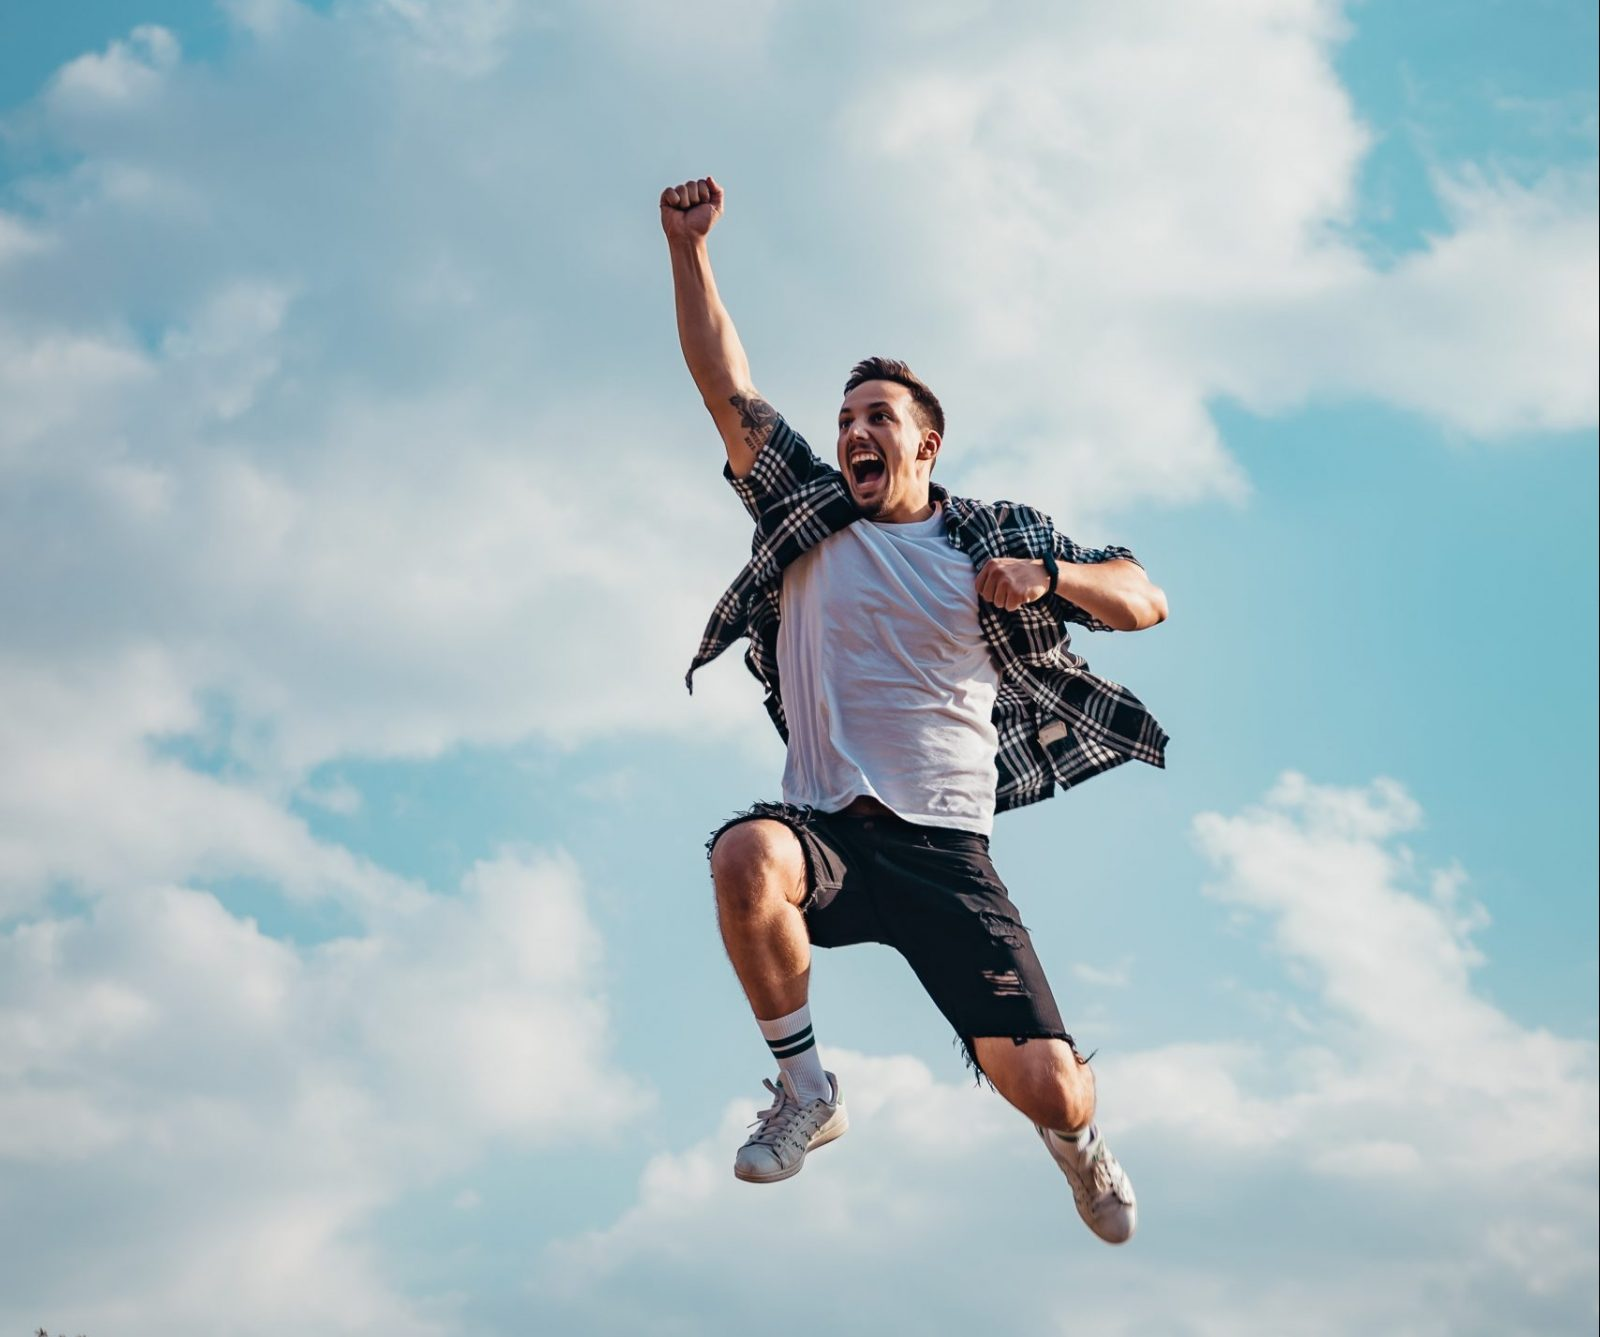 Geluk man springt gat in de lucht